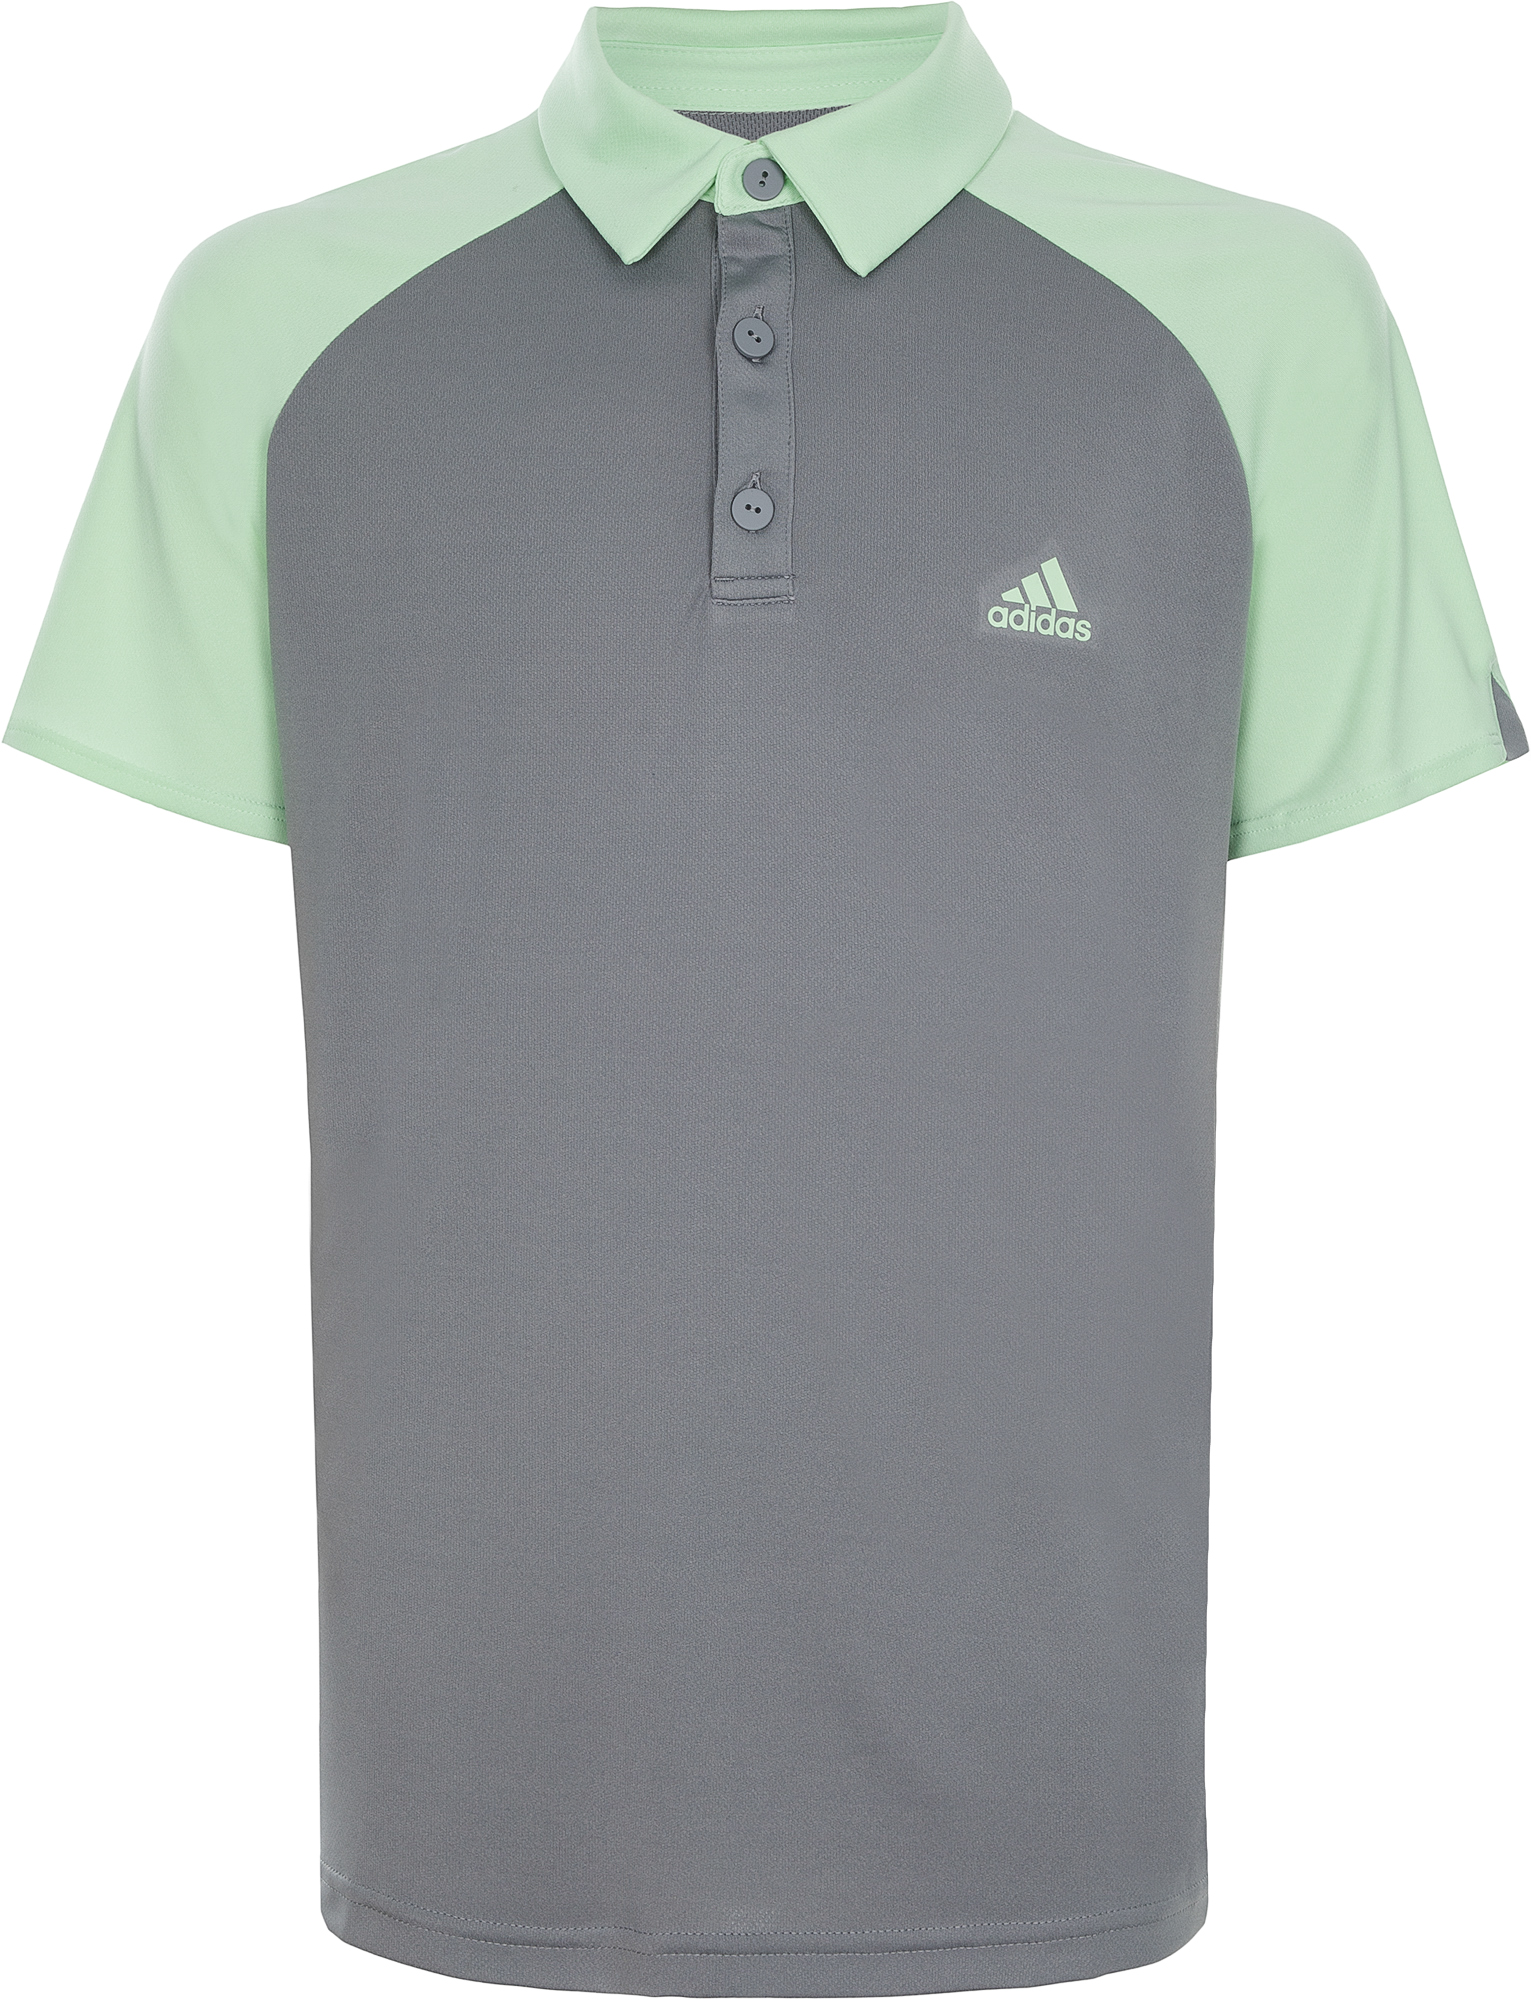 Adidas Поло для мальчиков Adidas Club, размер 170